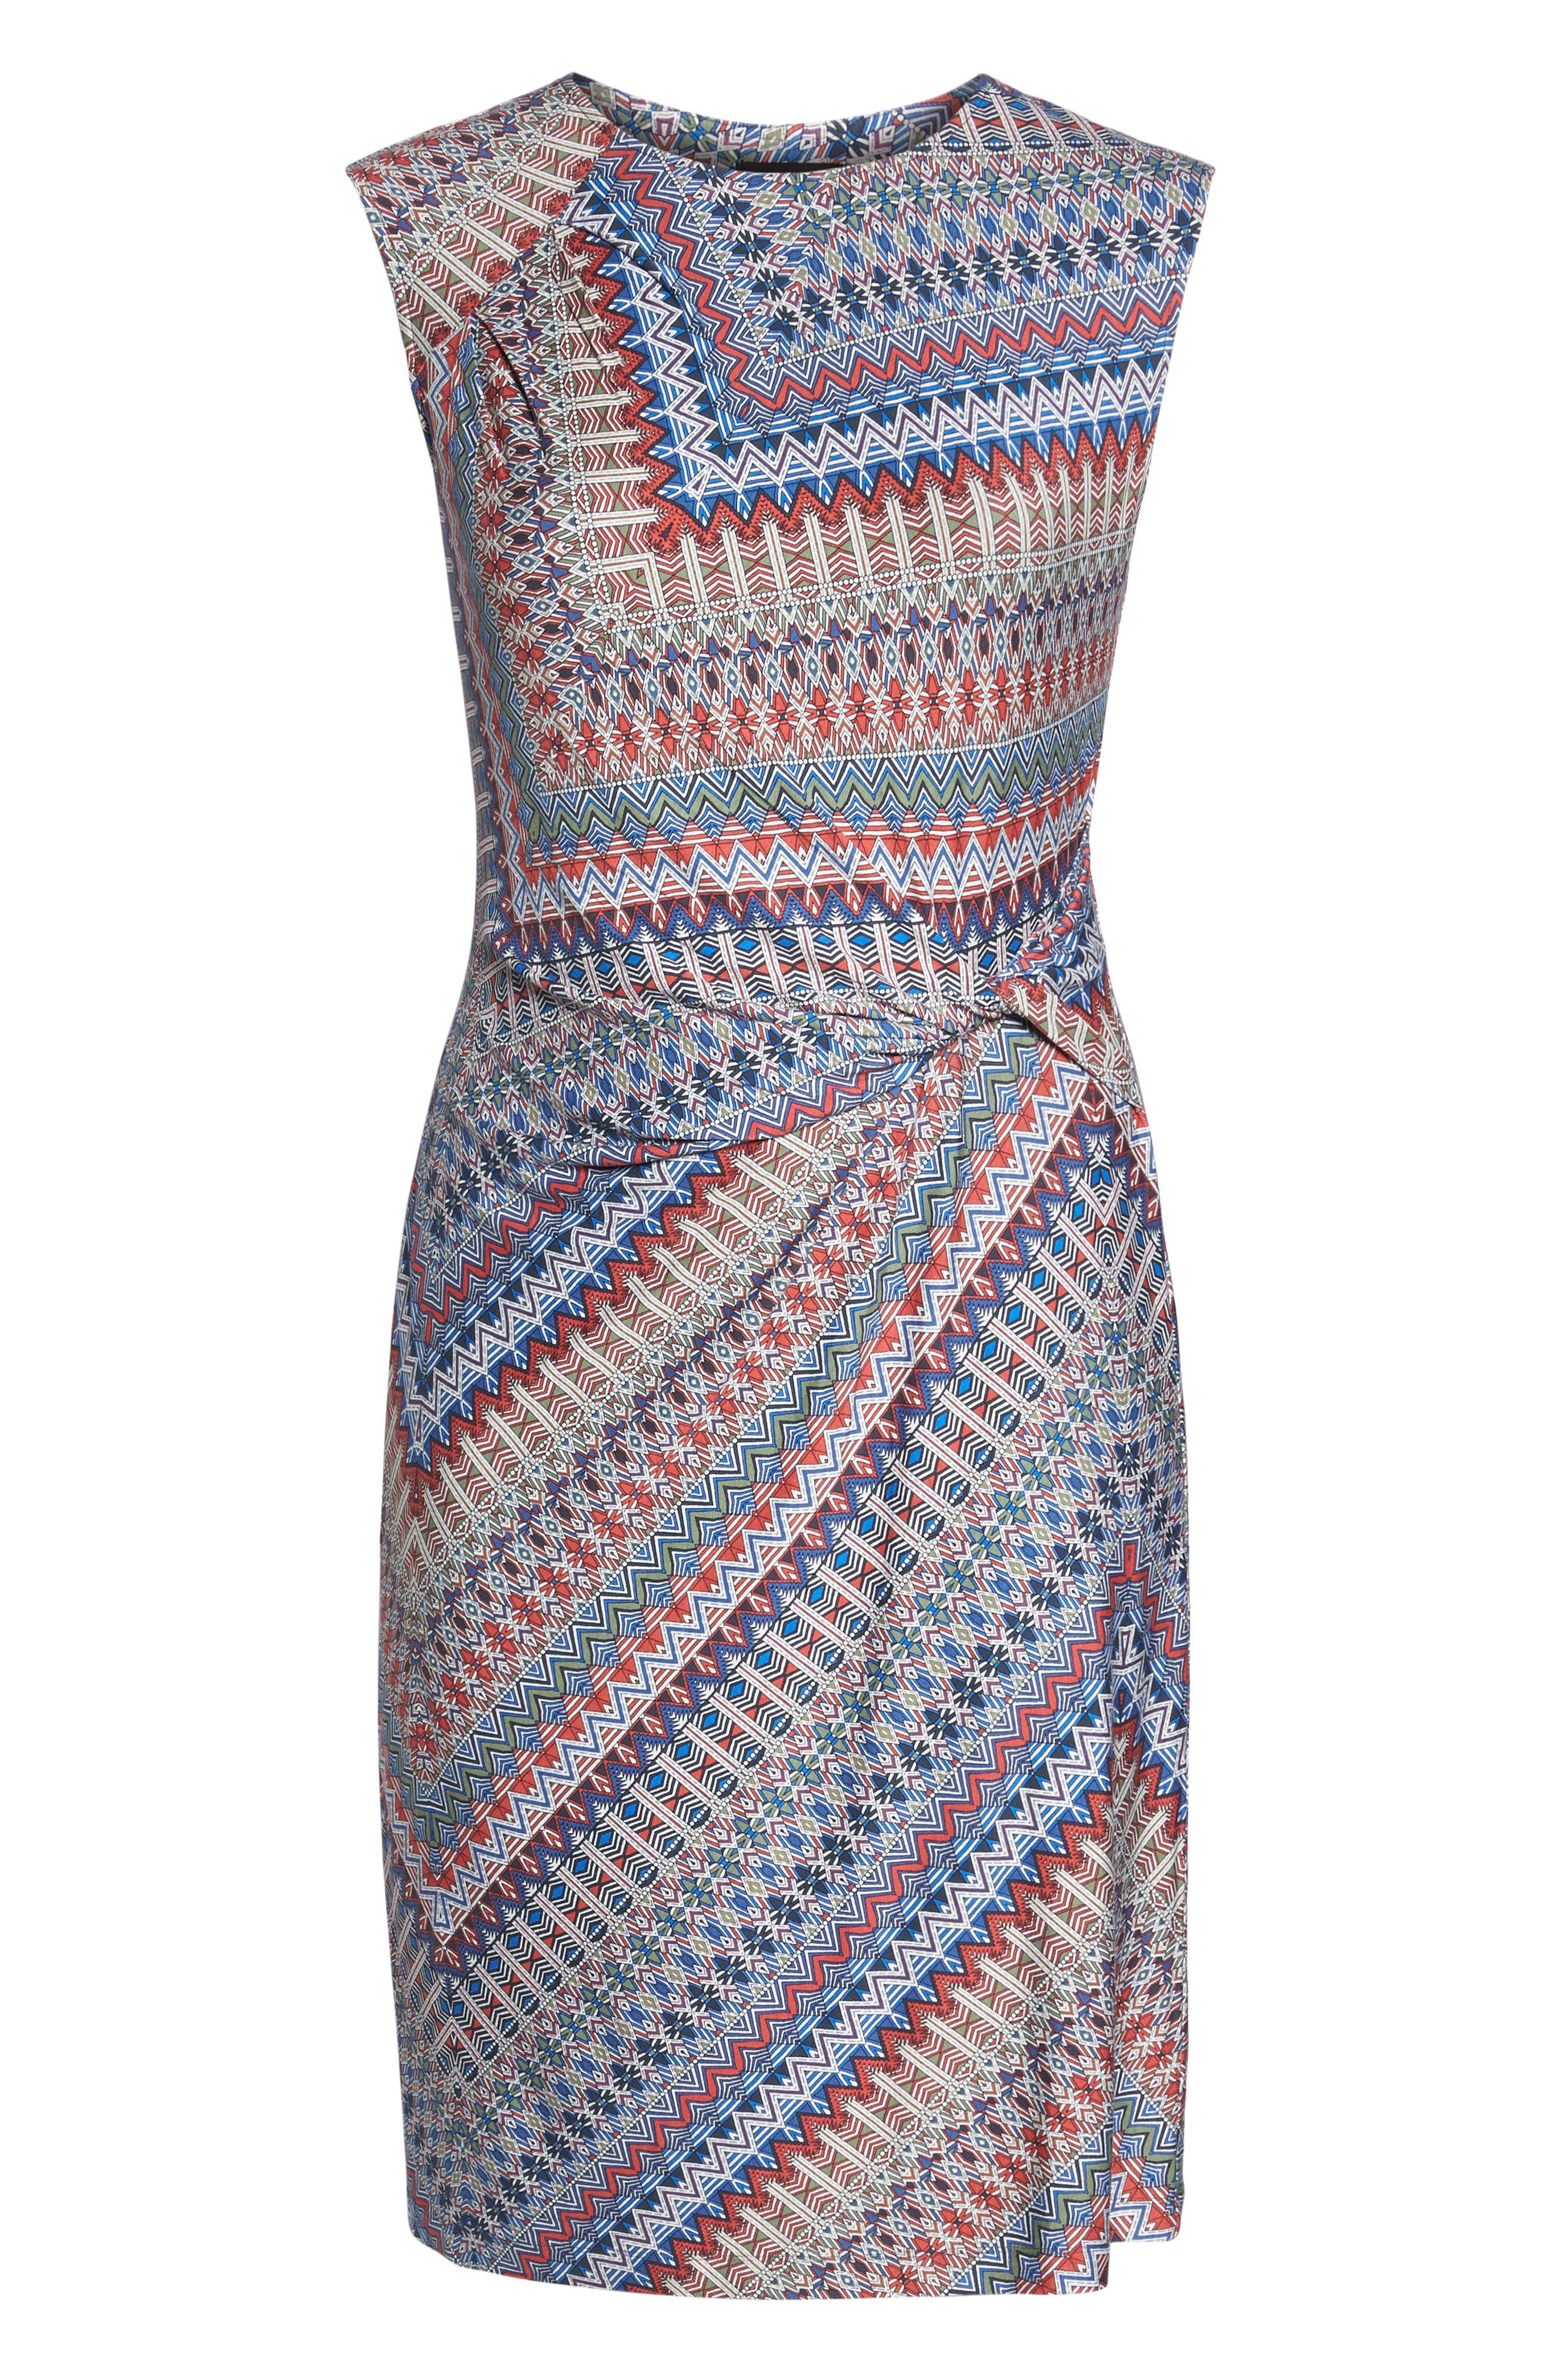 Zigzag Twist Dress,                             Alternate thumbnail 6, color,                             609